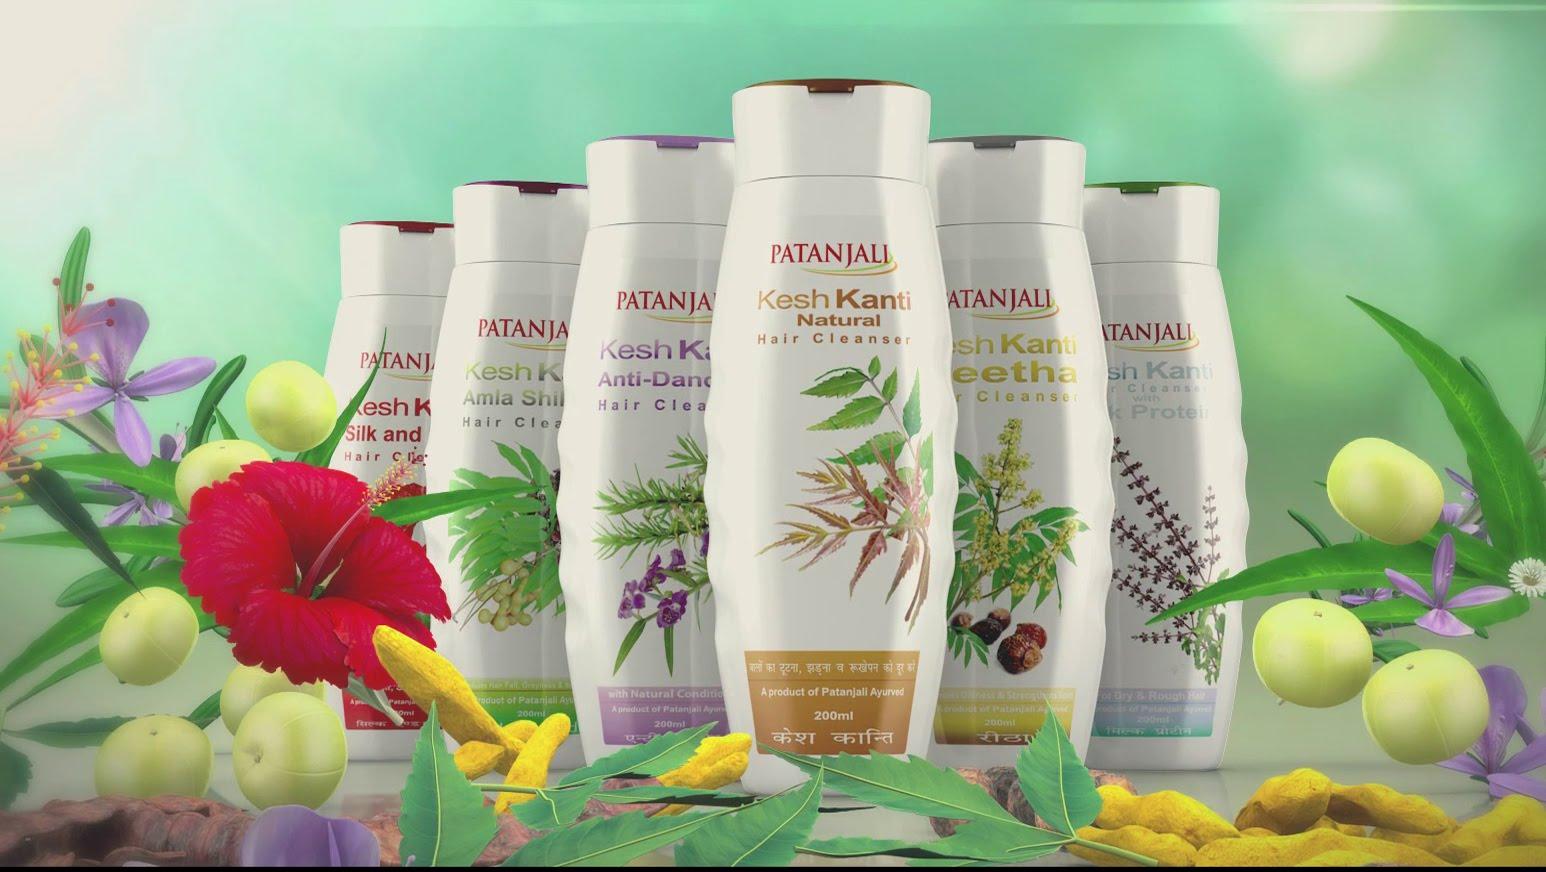 Patanjali Shampoo Online